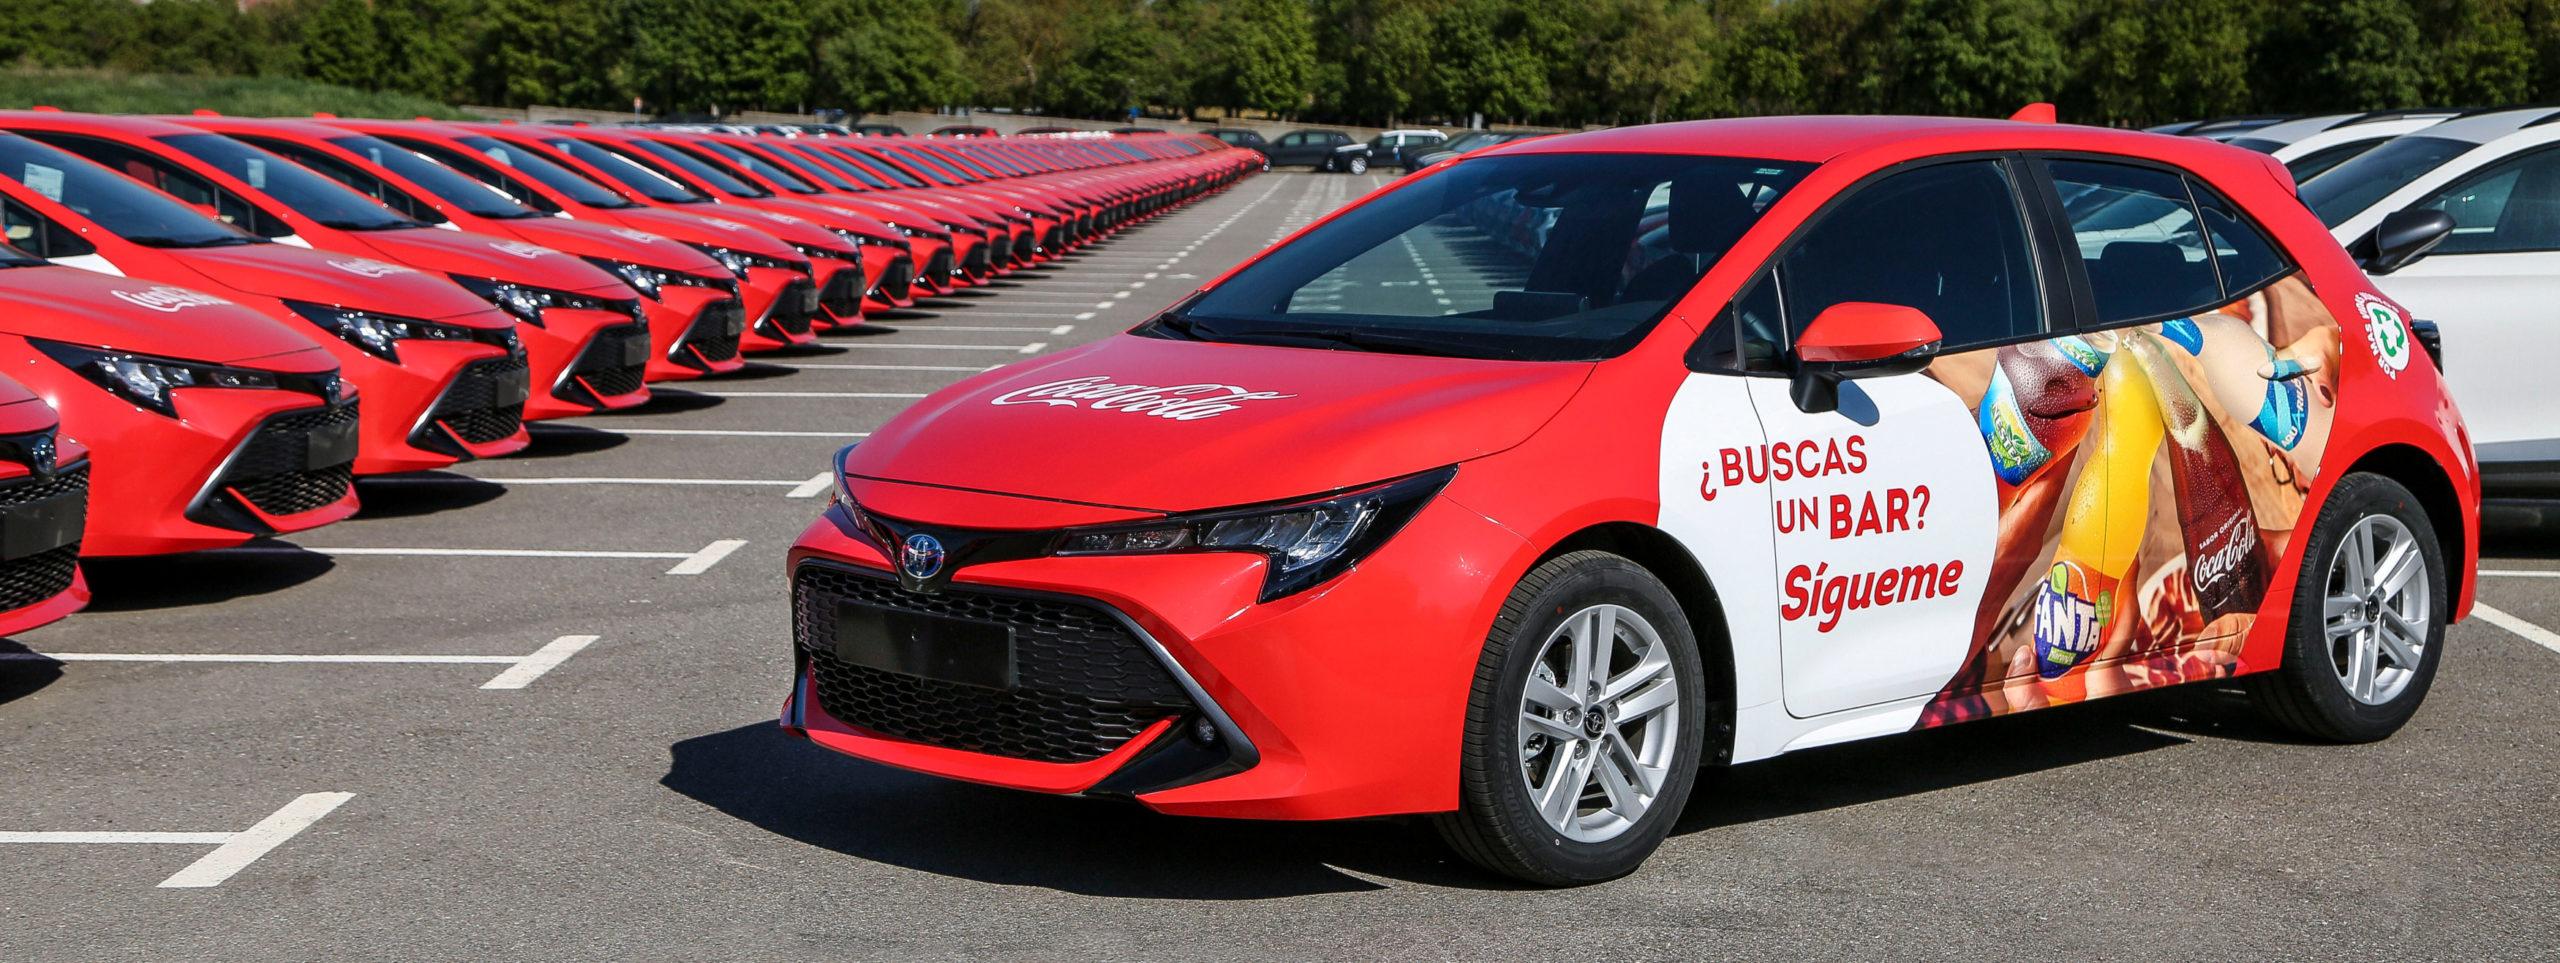 Toyota España ha hecho entrega de 115 vehículos híbridos eléctricos a Coca-Cola European Partners Iberia